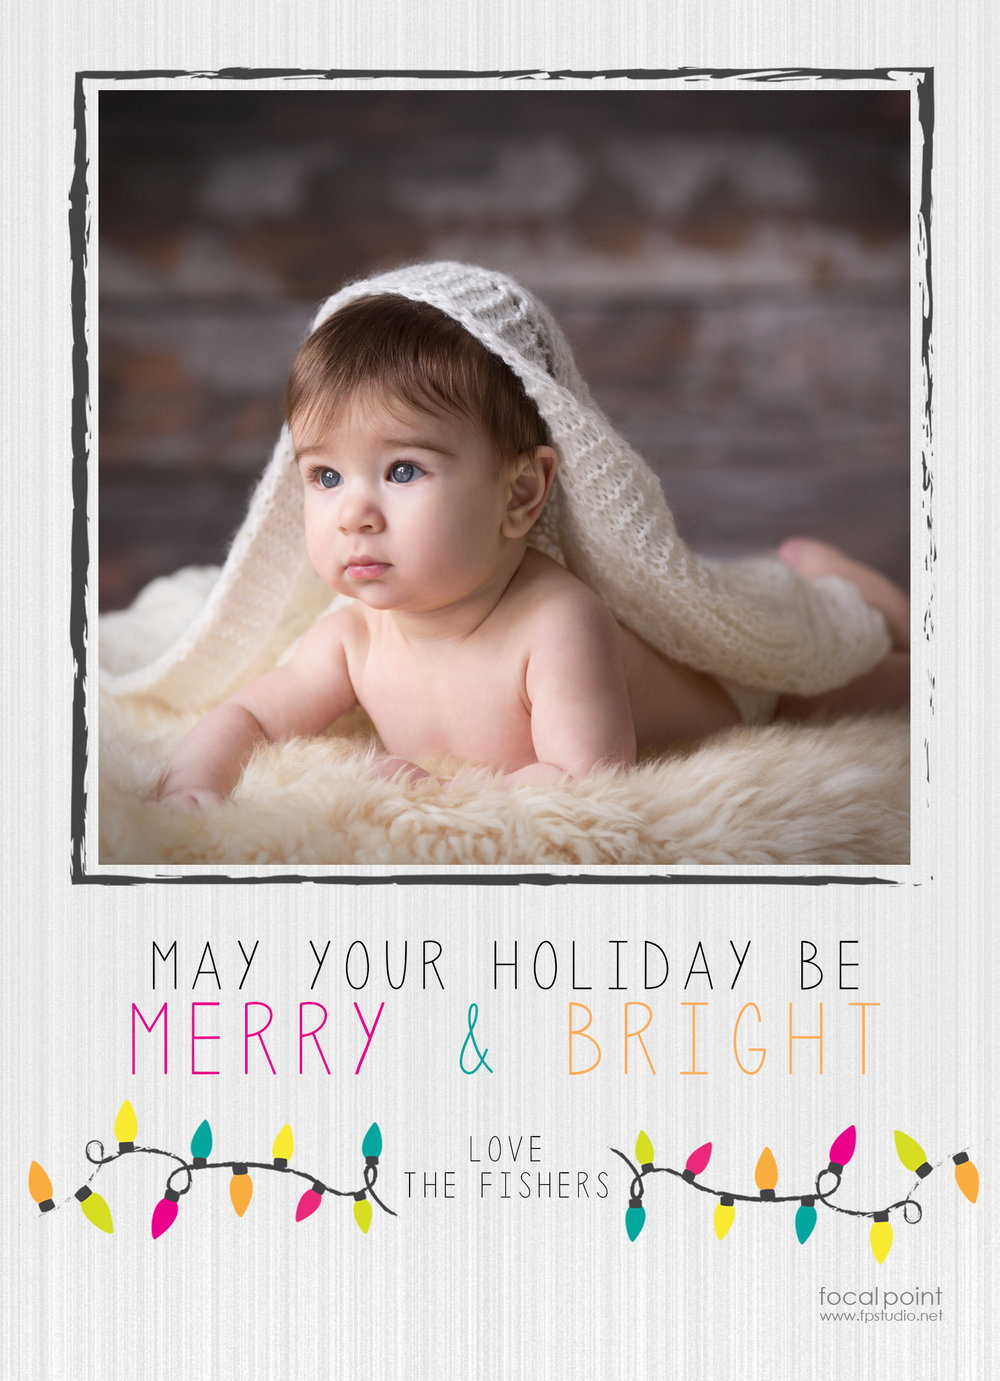 Merry & Bright (V)